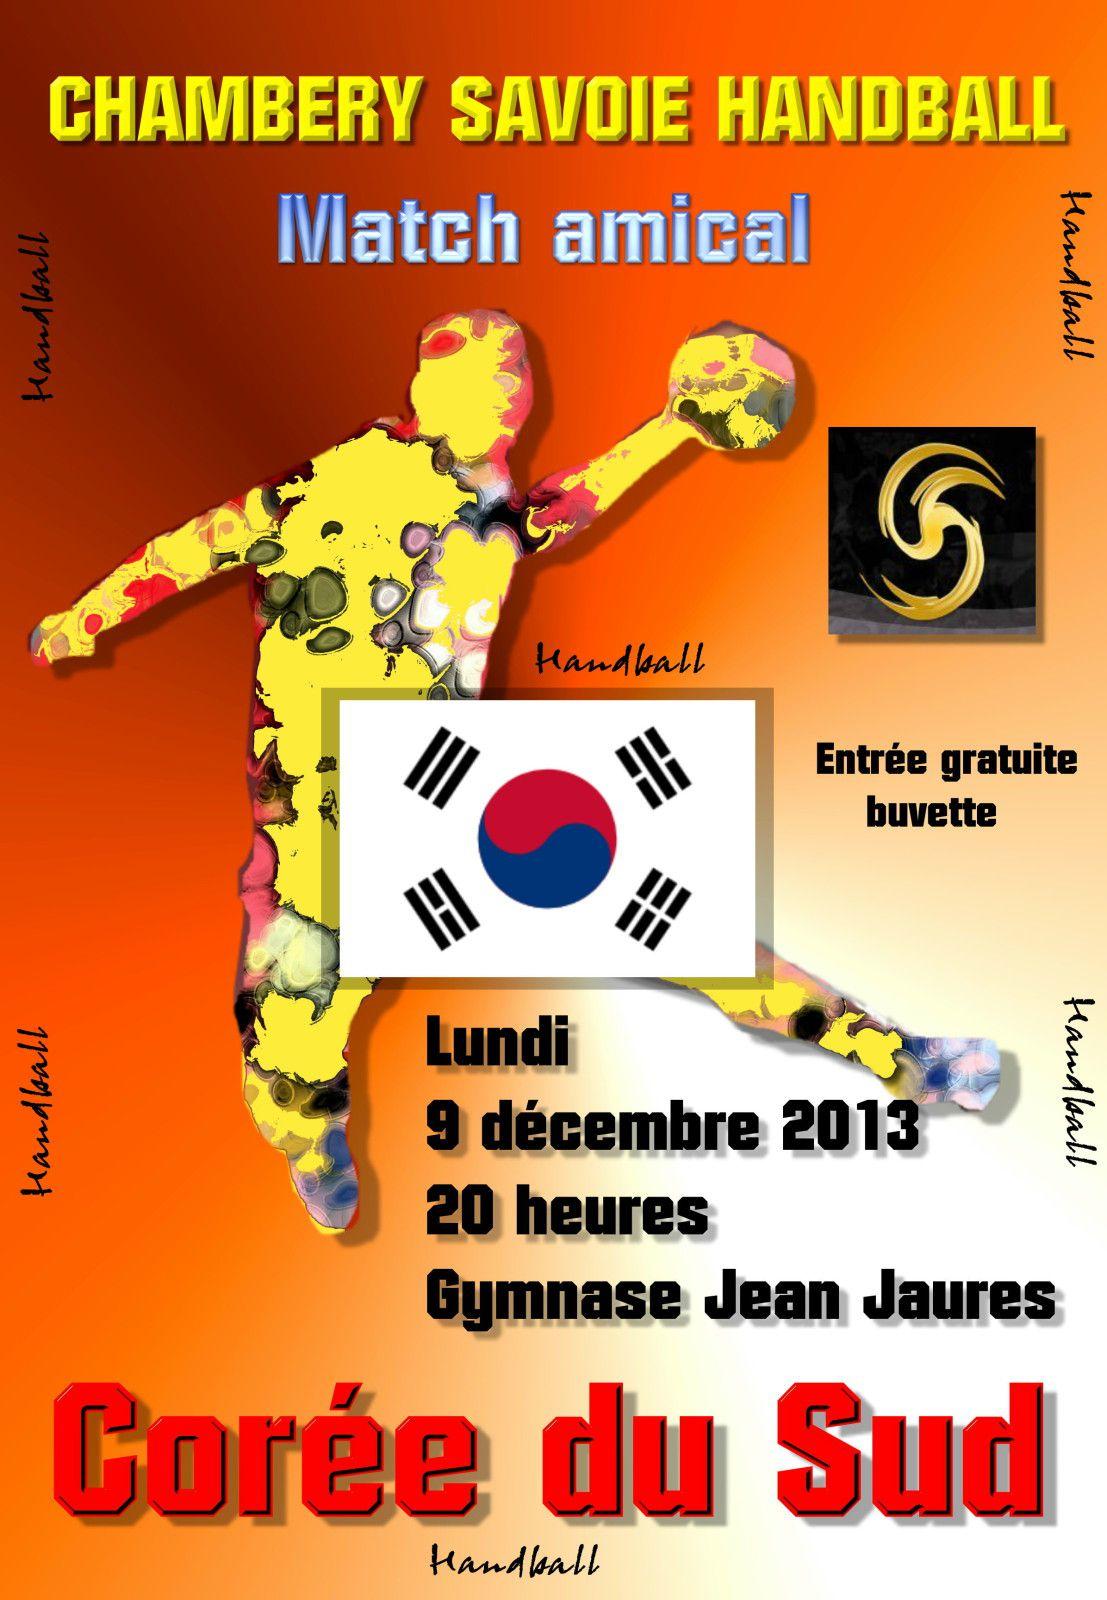 Affiche match amical CHAMBERY LA CORRE du sud 09 12 2013